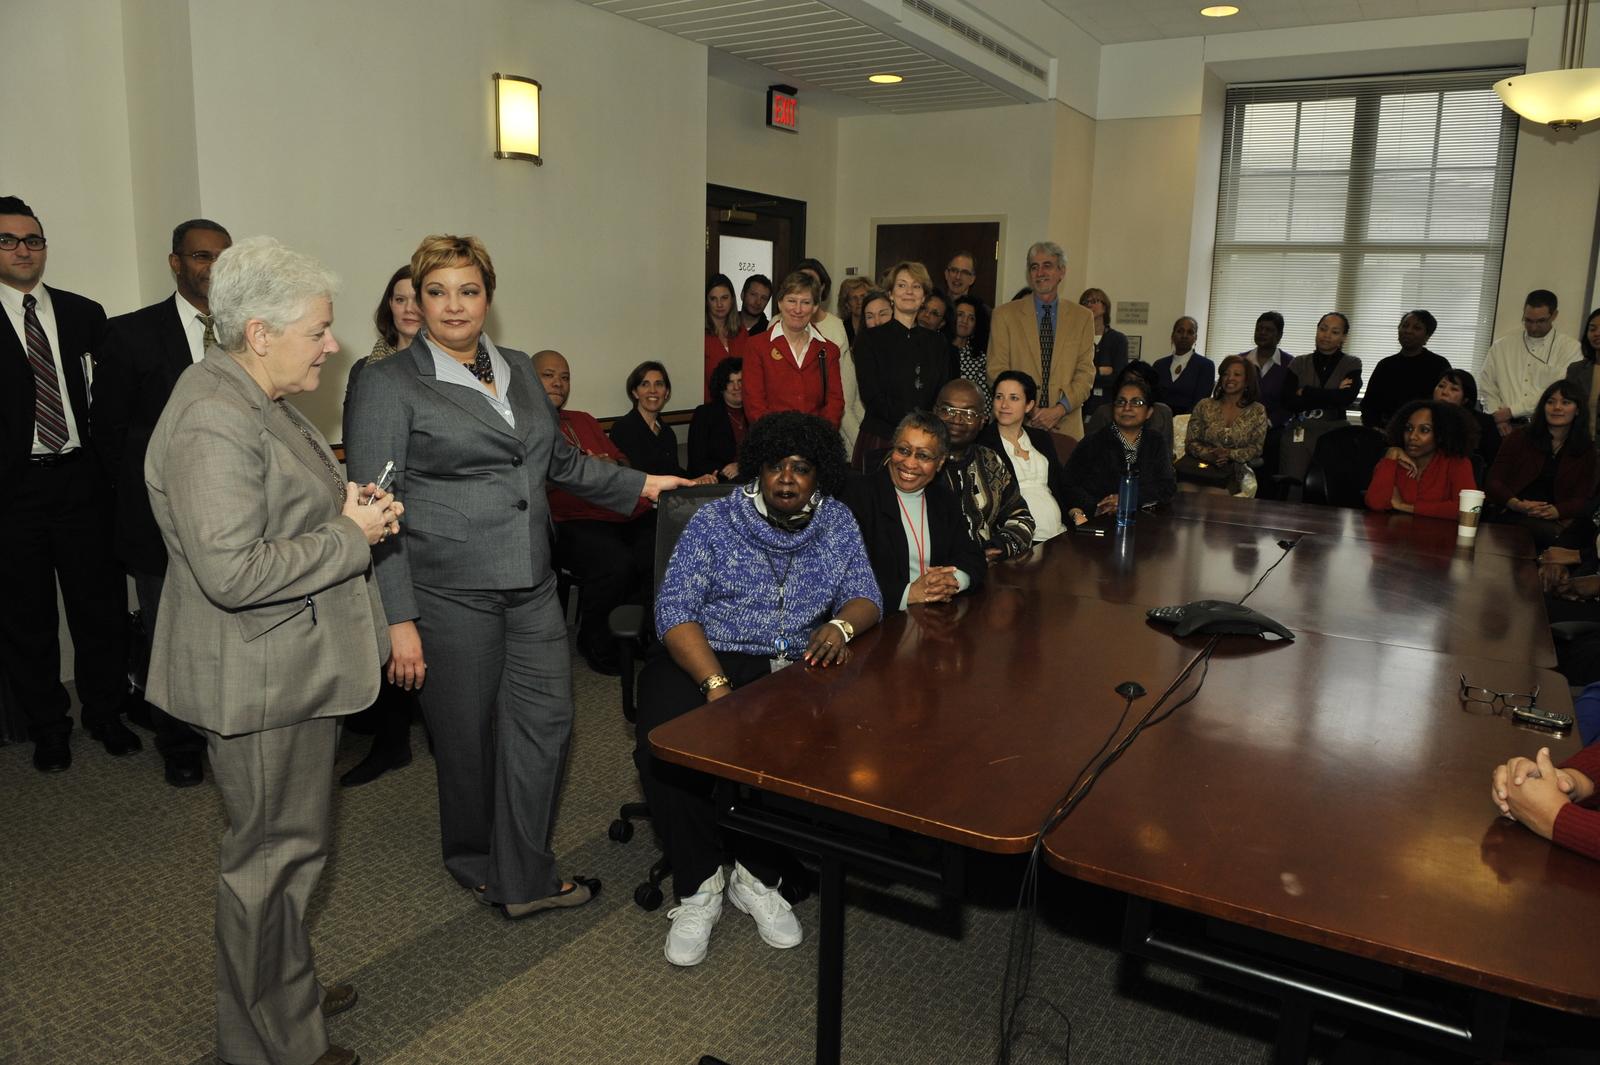 Office of the Administrator - Lisa Jackson's Farewell Tour [412-APD-1115-2013-02-07_FarewellTour_145.JPG]